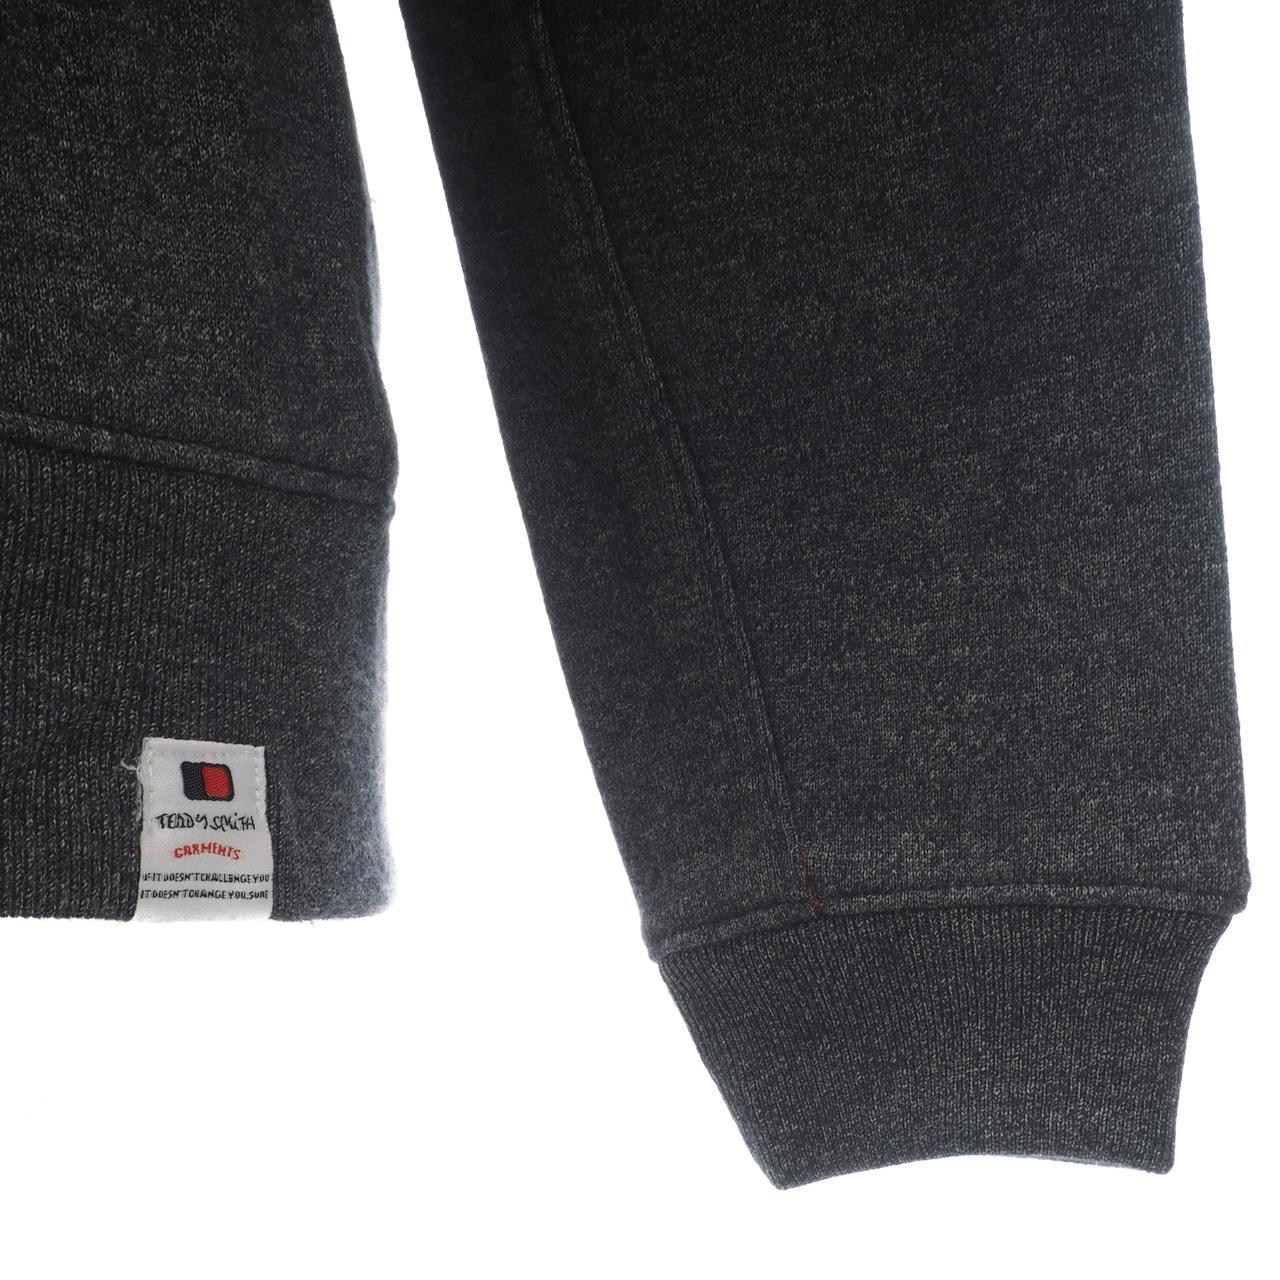 Jacken-Sweatshirts-Zipped-Kapuze-Teddy-Smith-Gafe-Blood-Fz-Umhang-Sw-Jr-Rot Indexbild 3